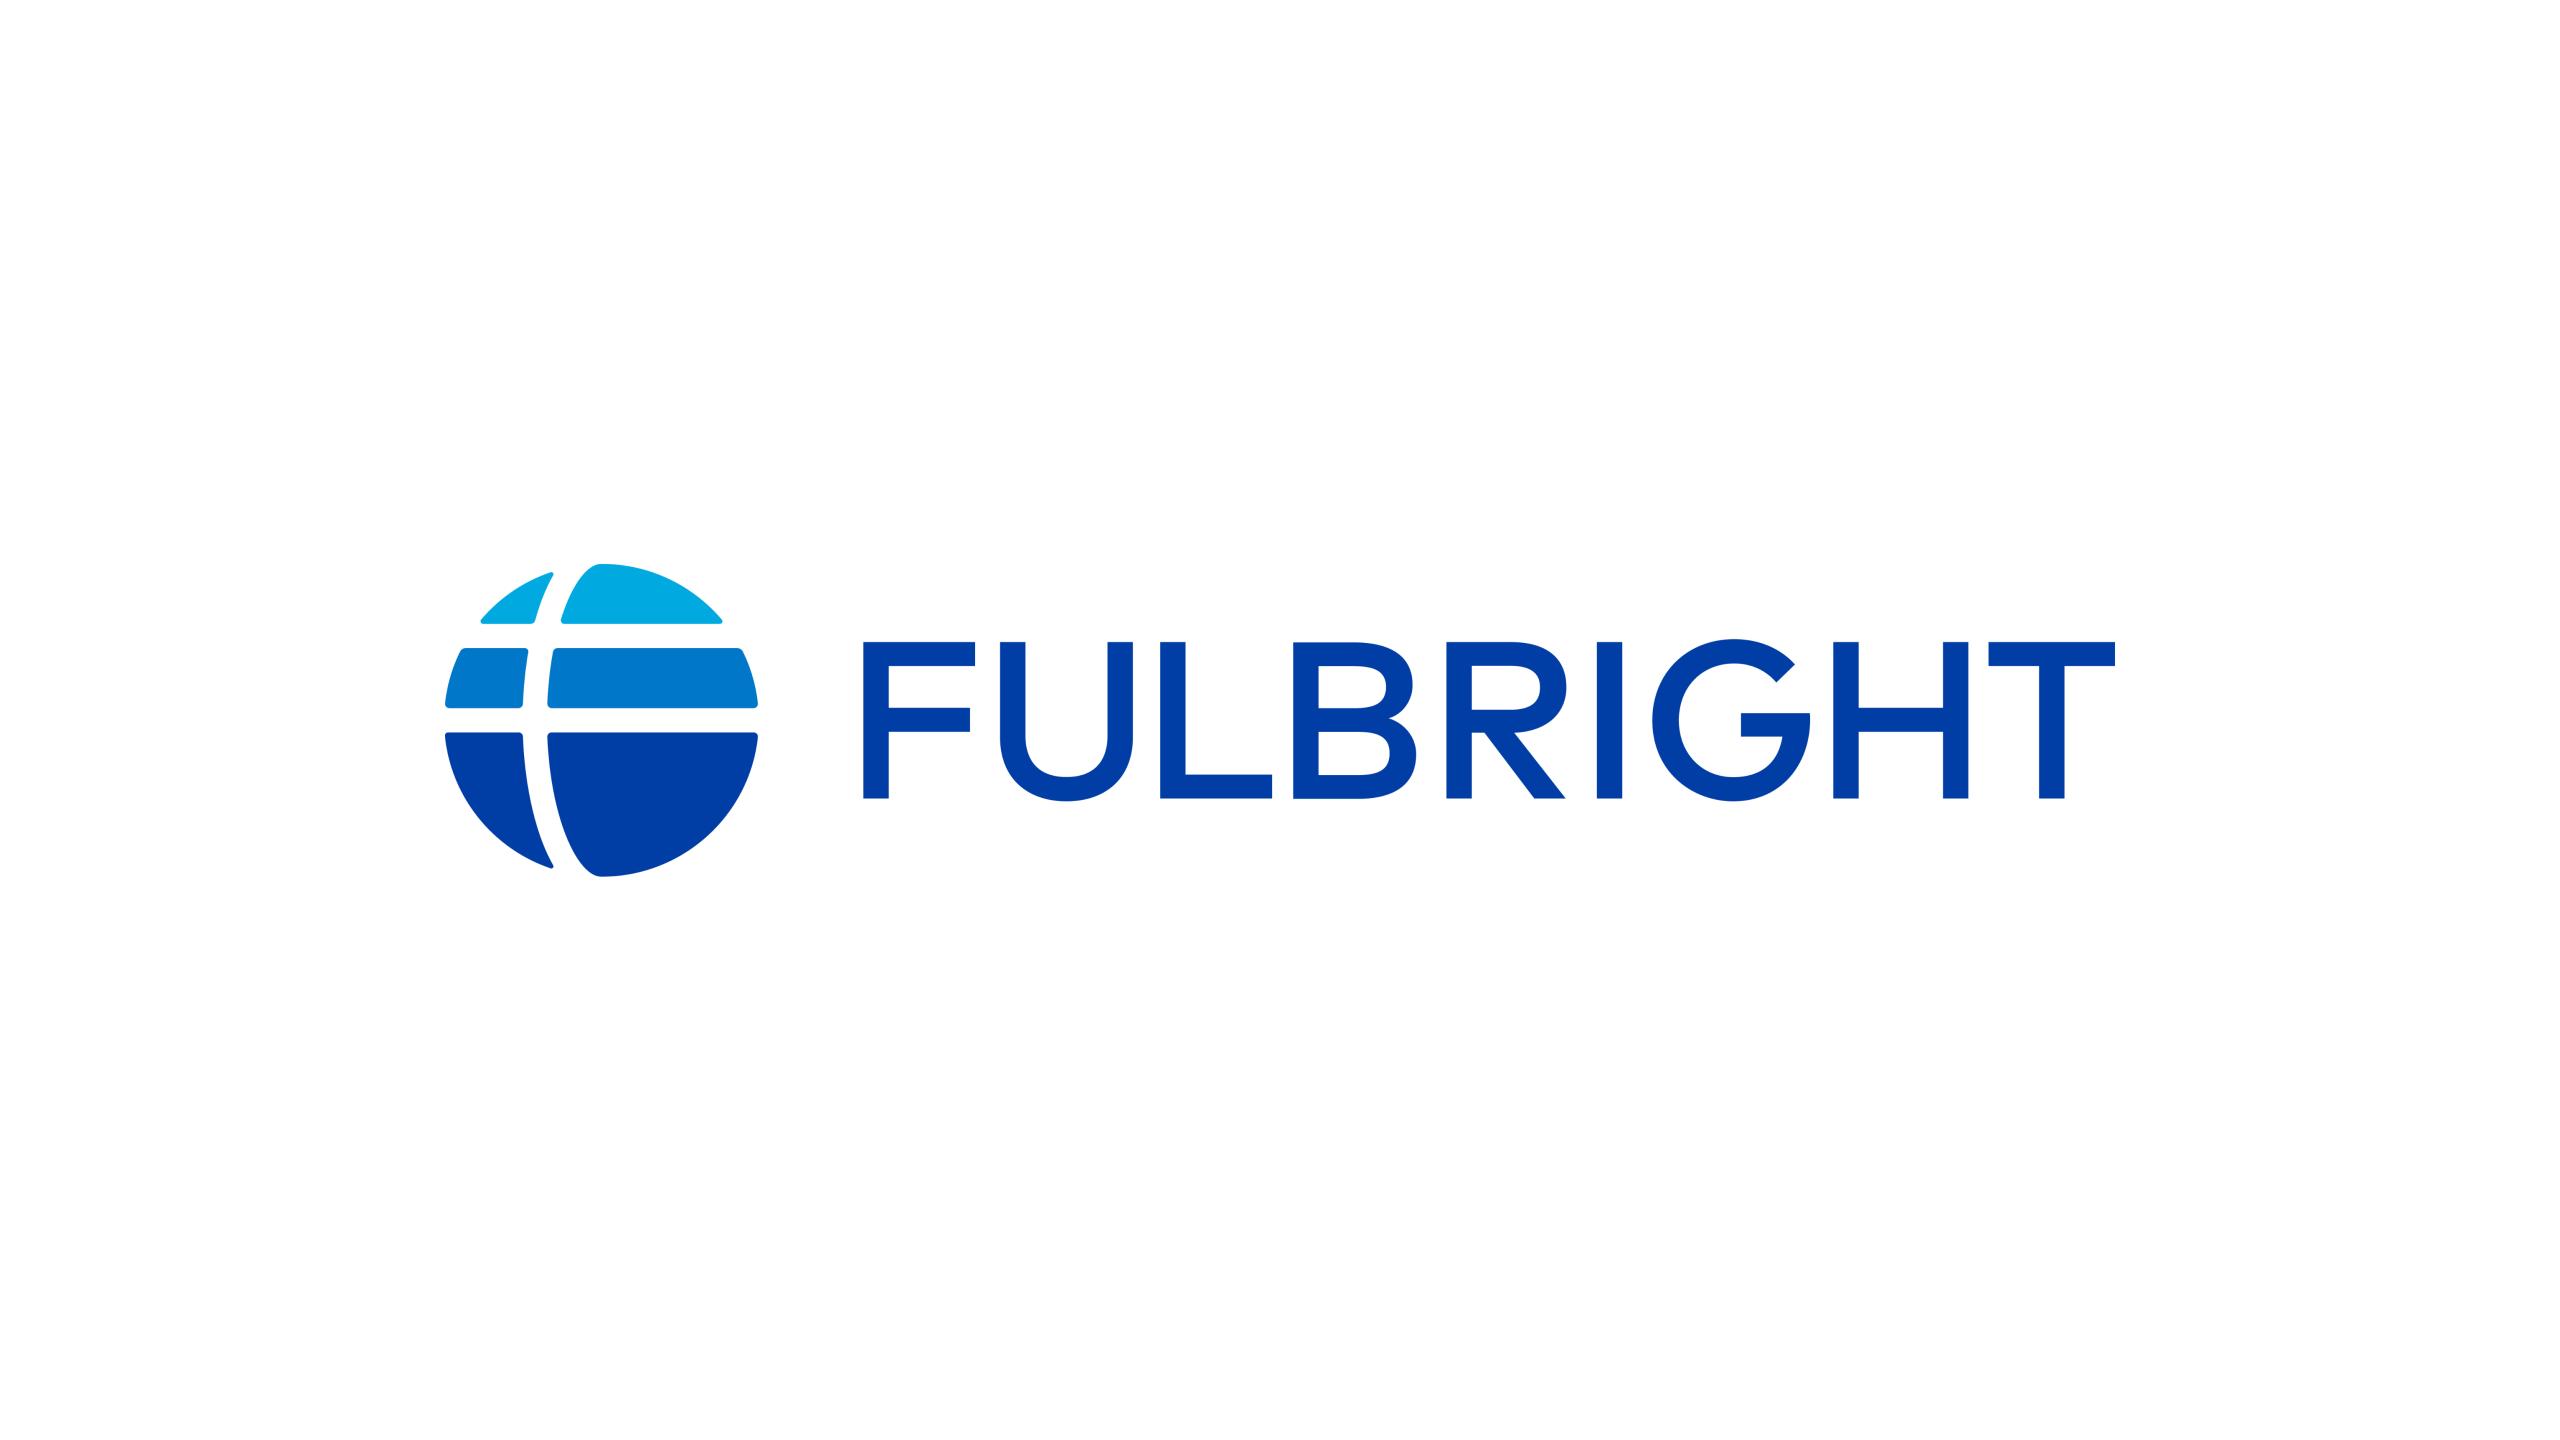 Ohio State Academic Calendar 2022 2023.Fulbright Scholar In Residence Program 2022 2023 Overview Webinar Office Of International Affairs The Ohio State University